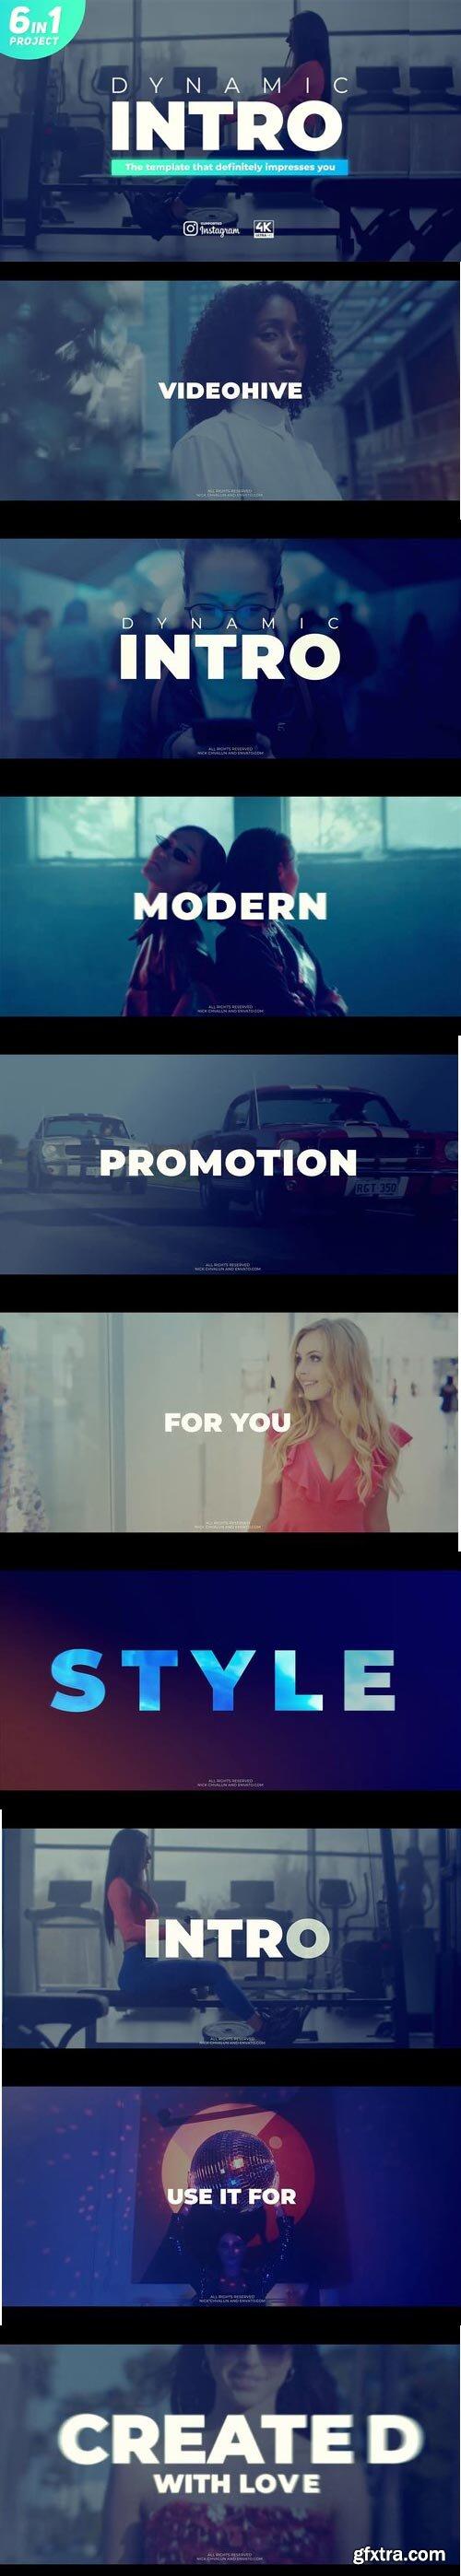 Videohive - Intro Slideshow - 29442511